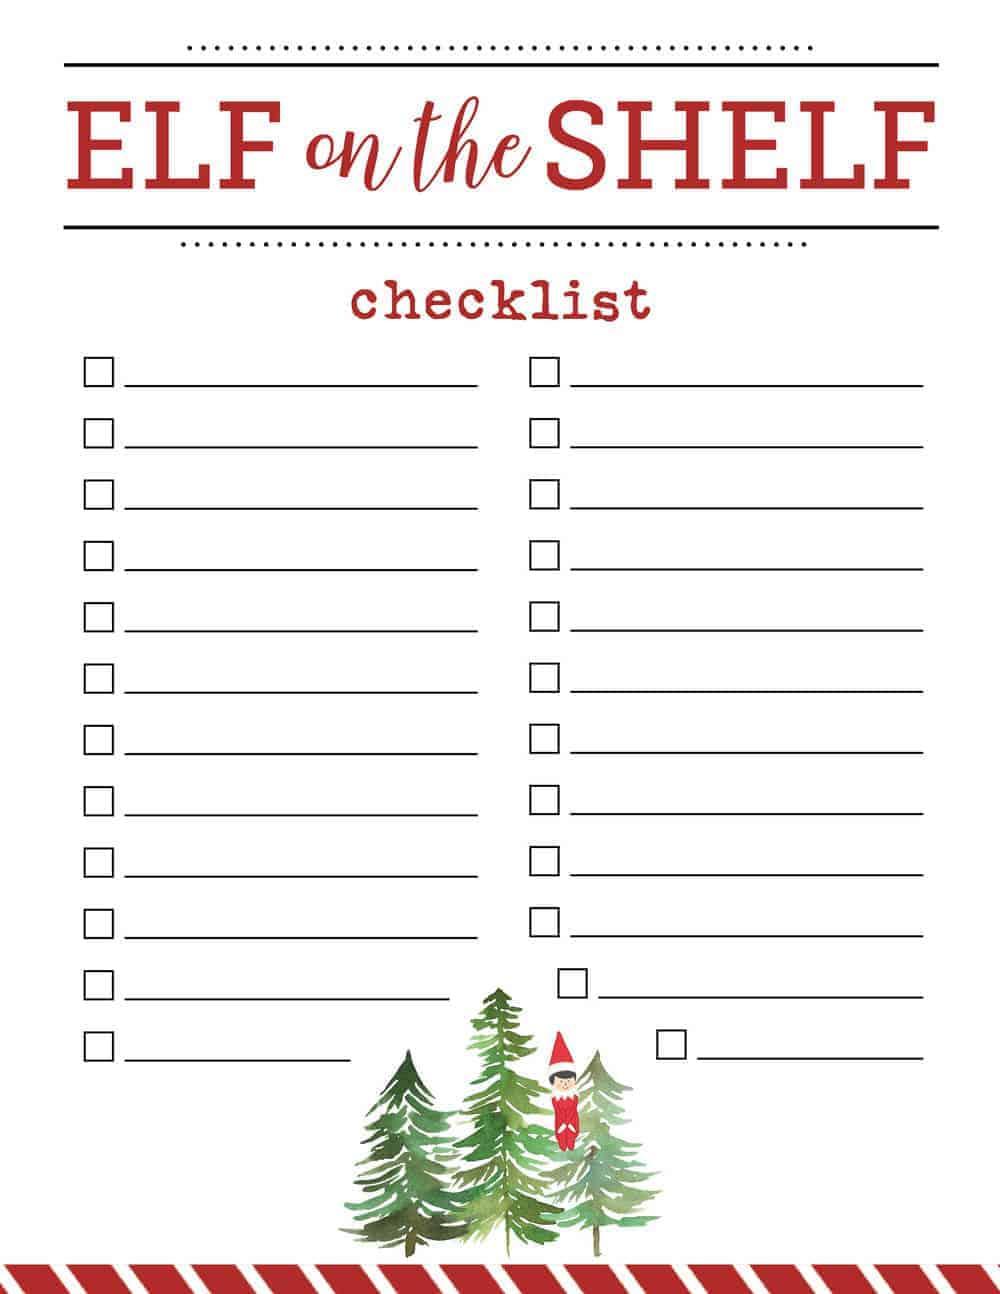 elf on the shelf checklist